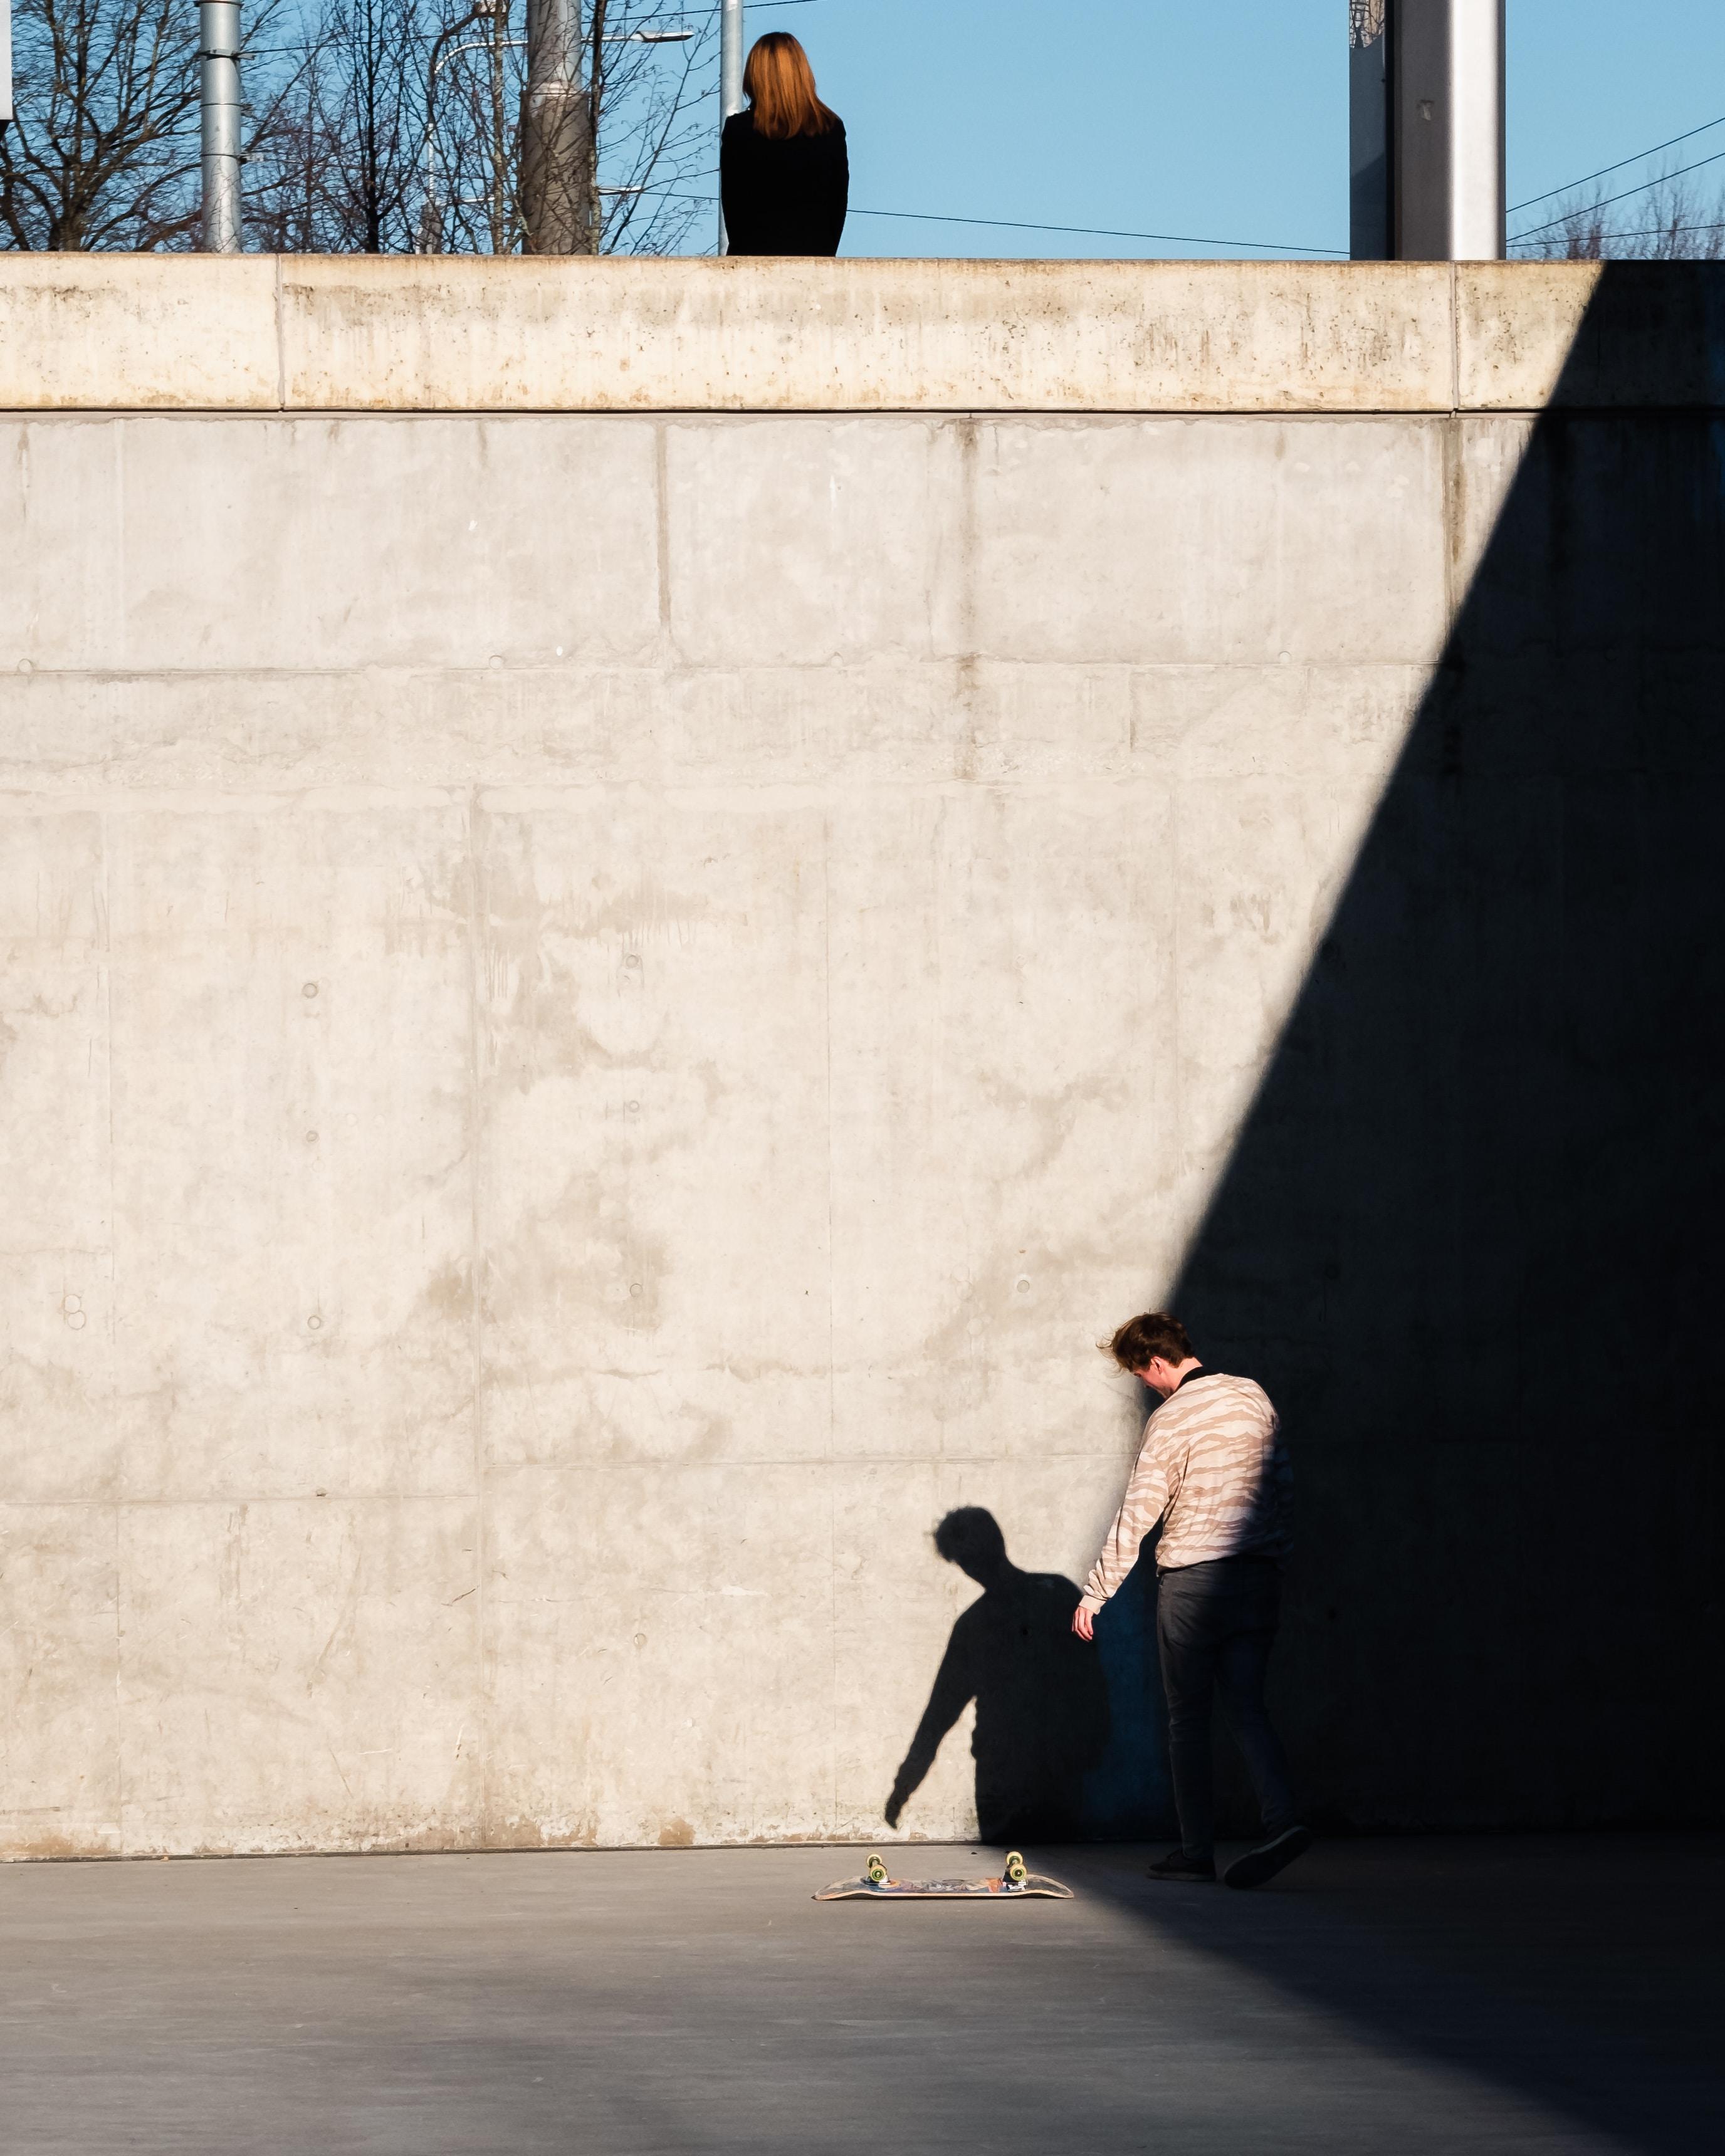 man standing beside skateboard